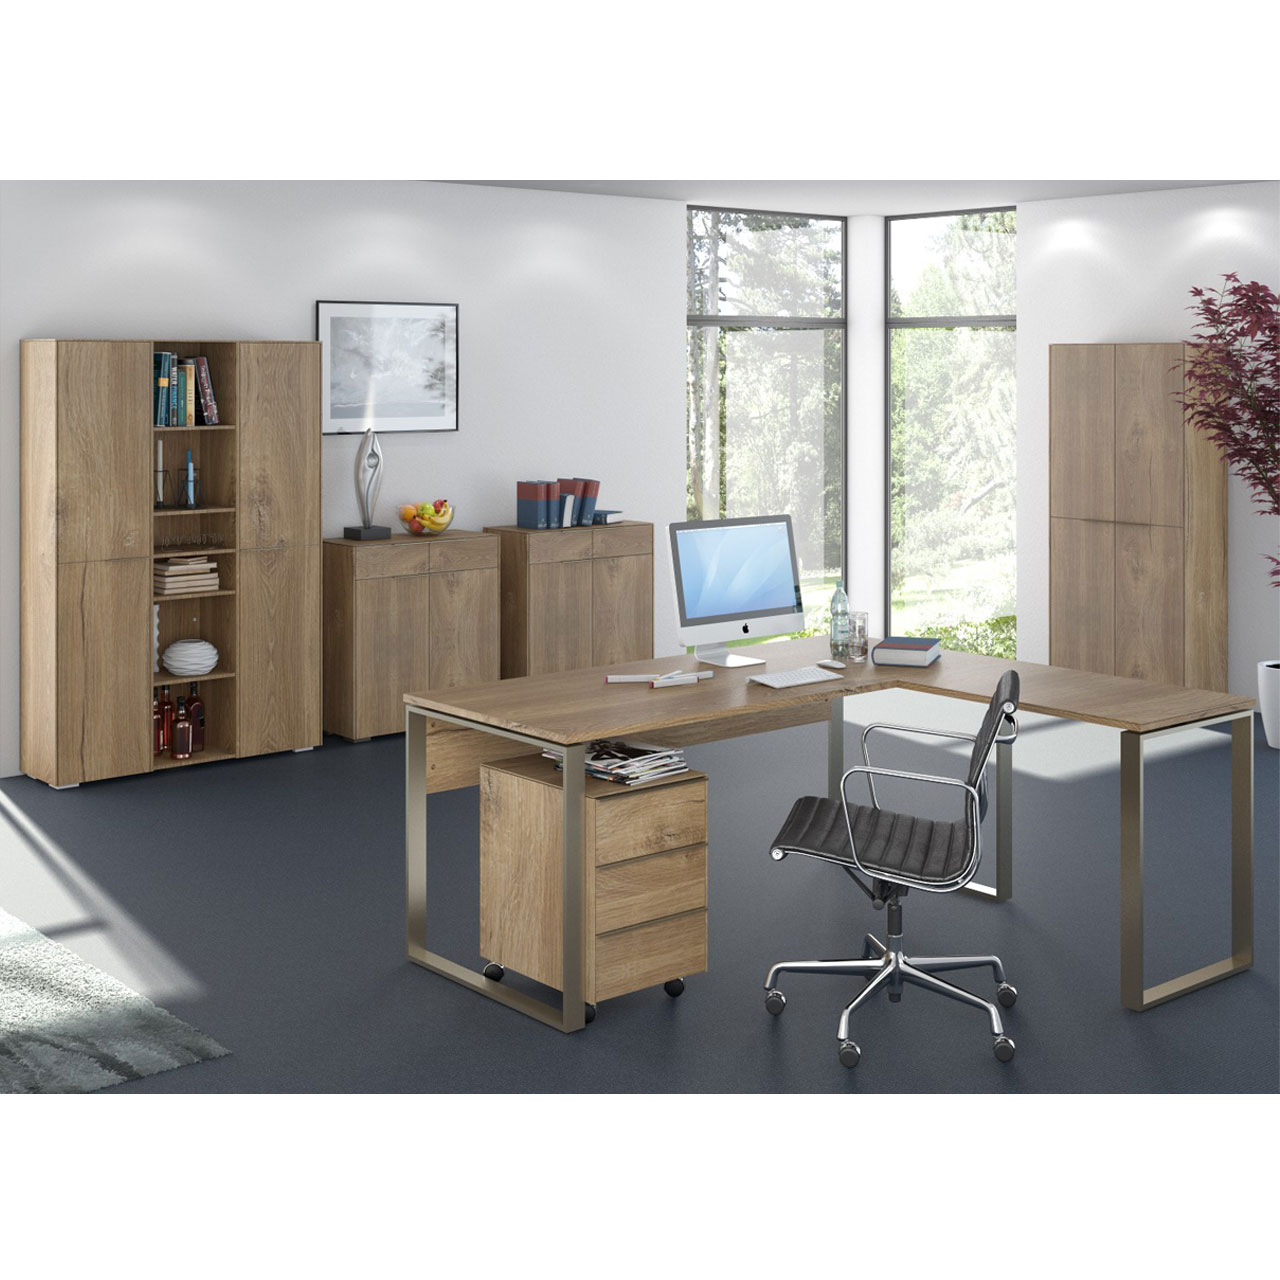 maja b ro yolo in riviera eiche typ 1 moebel dich. Black Bedroom Furniture Sets. Home Design Ideas